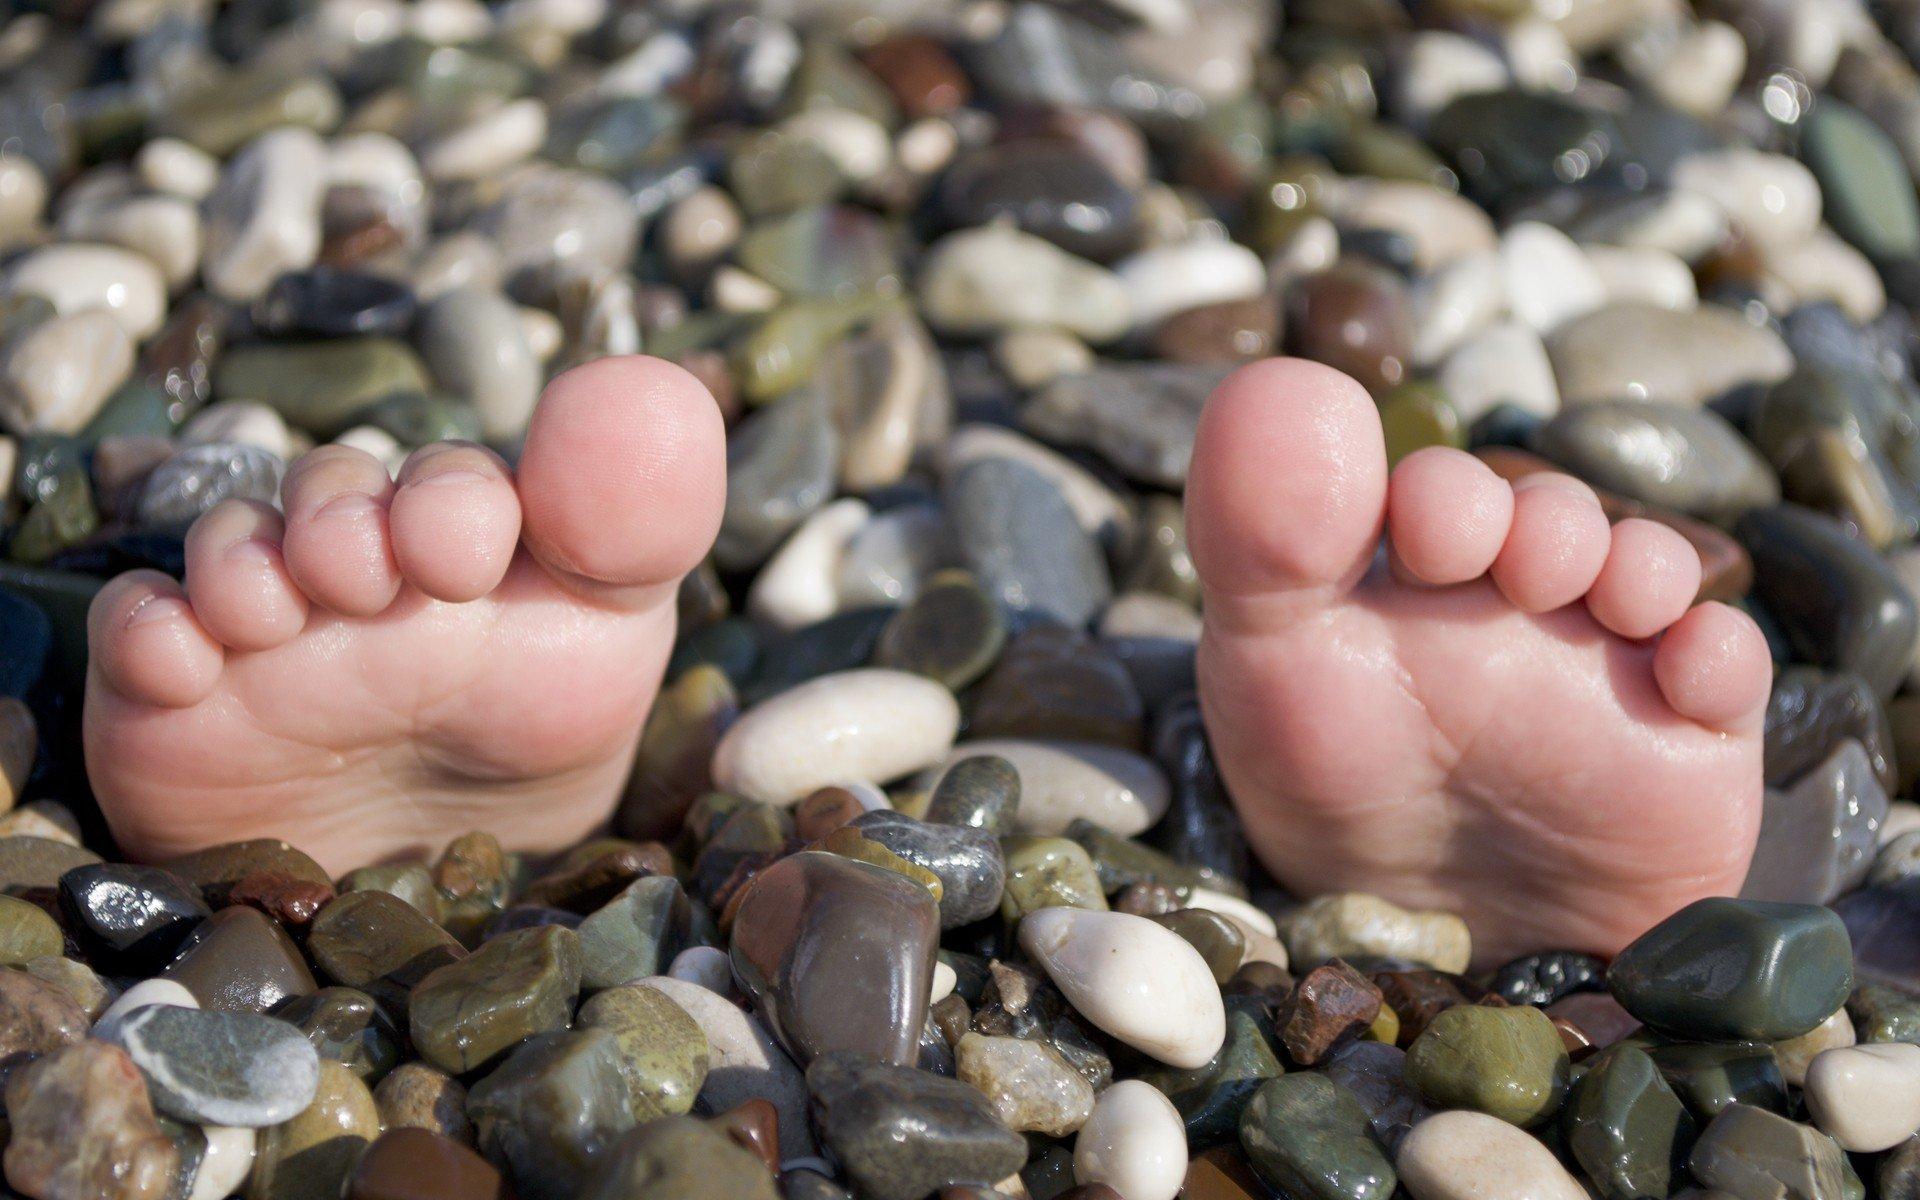 Картинки с камнями человека